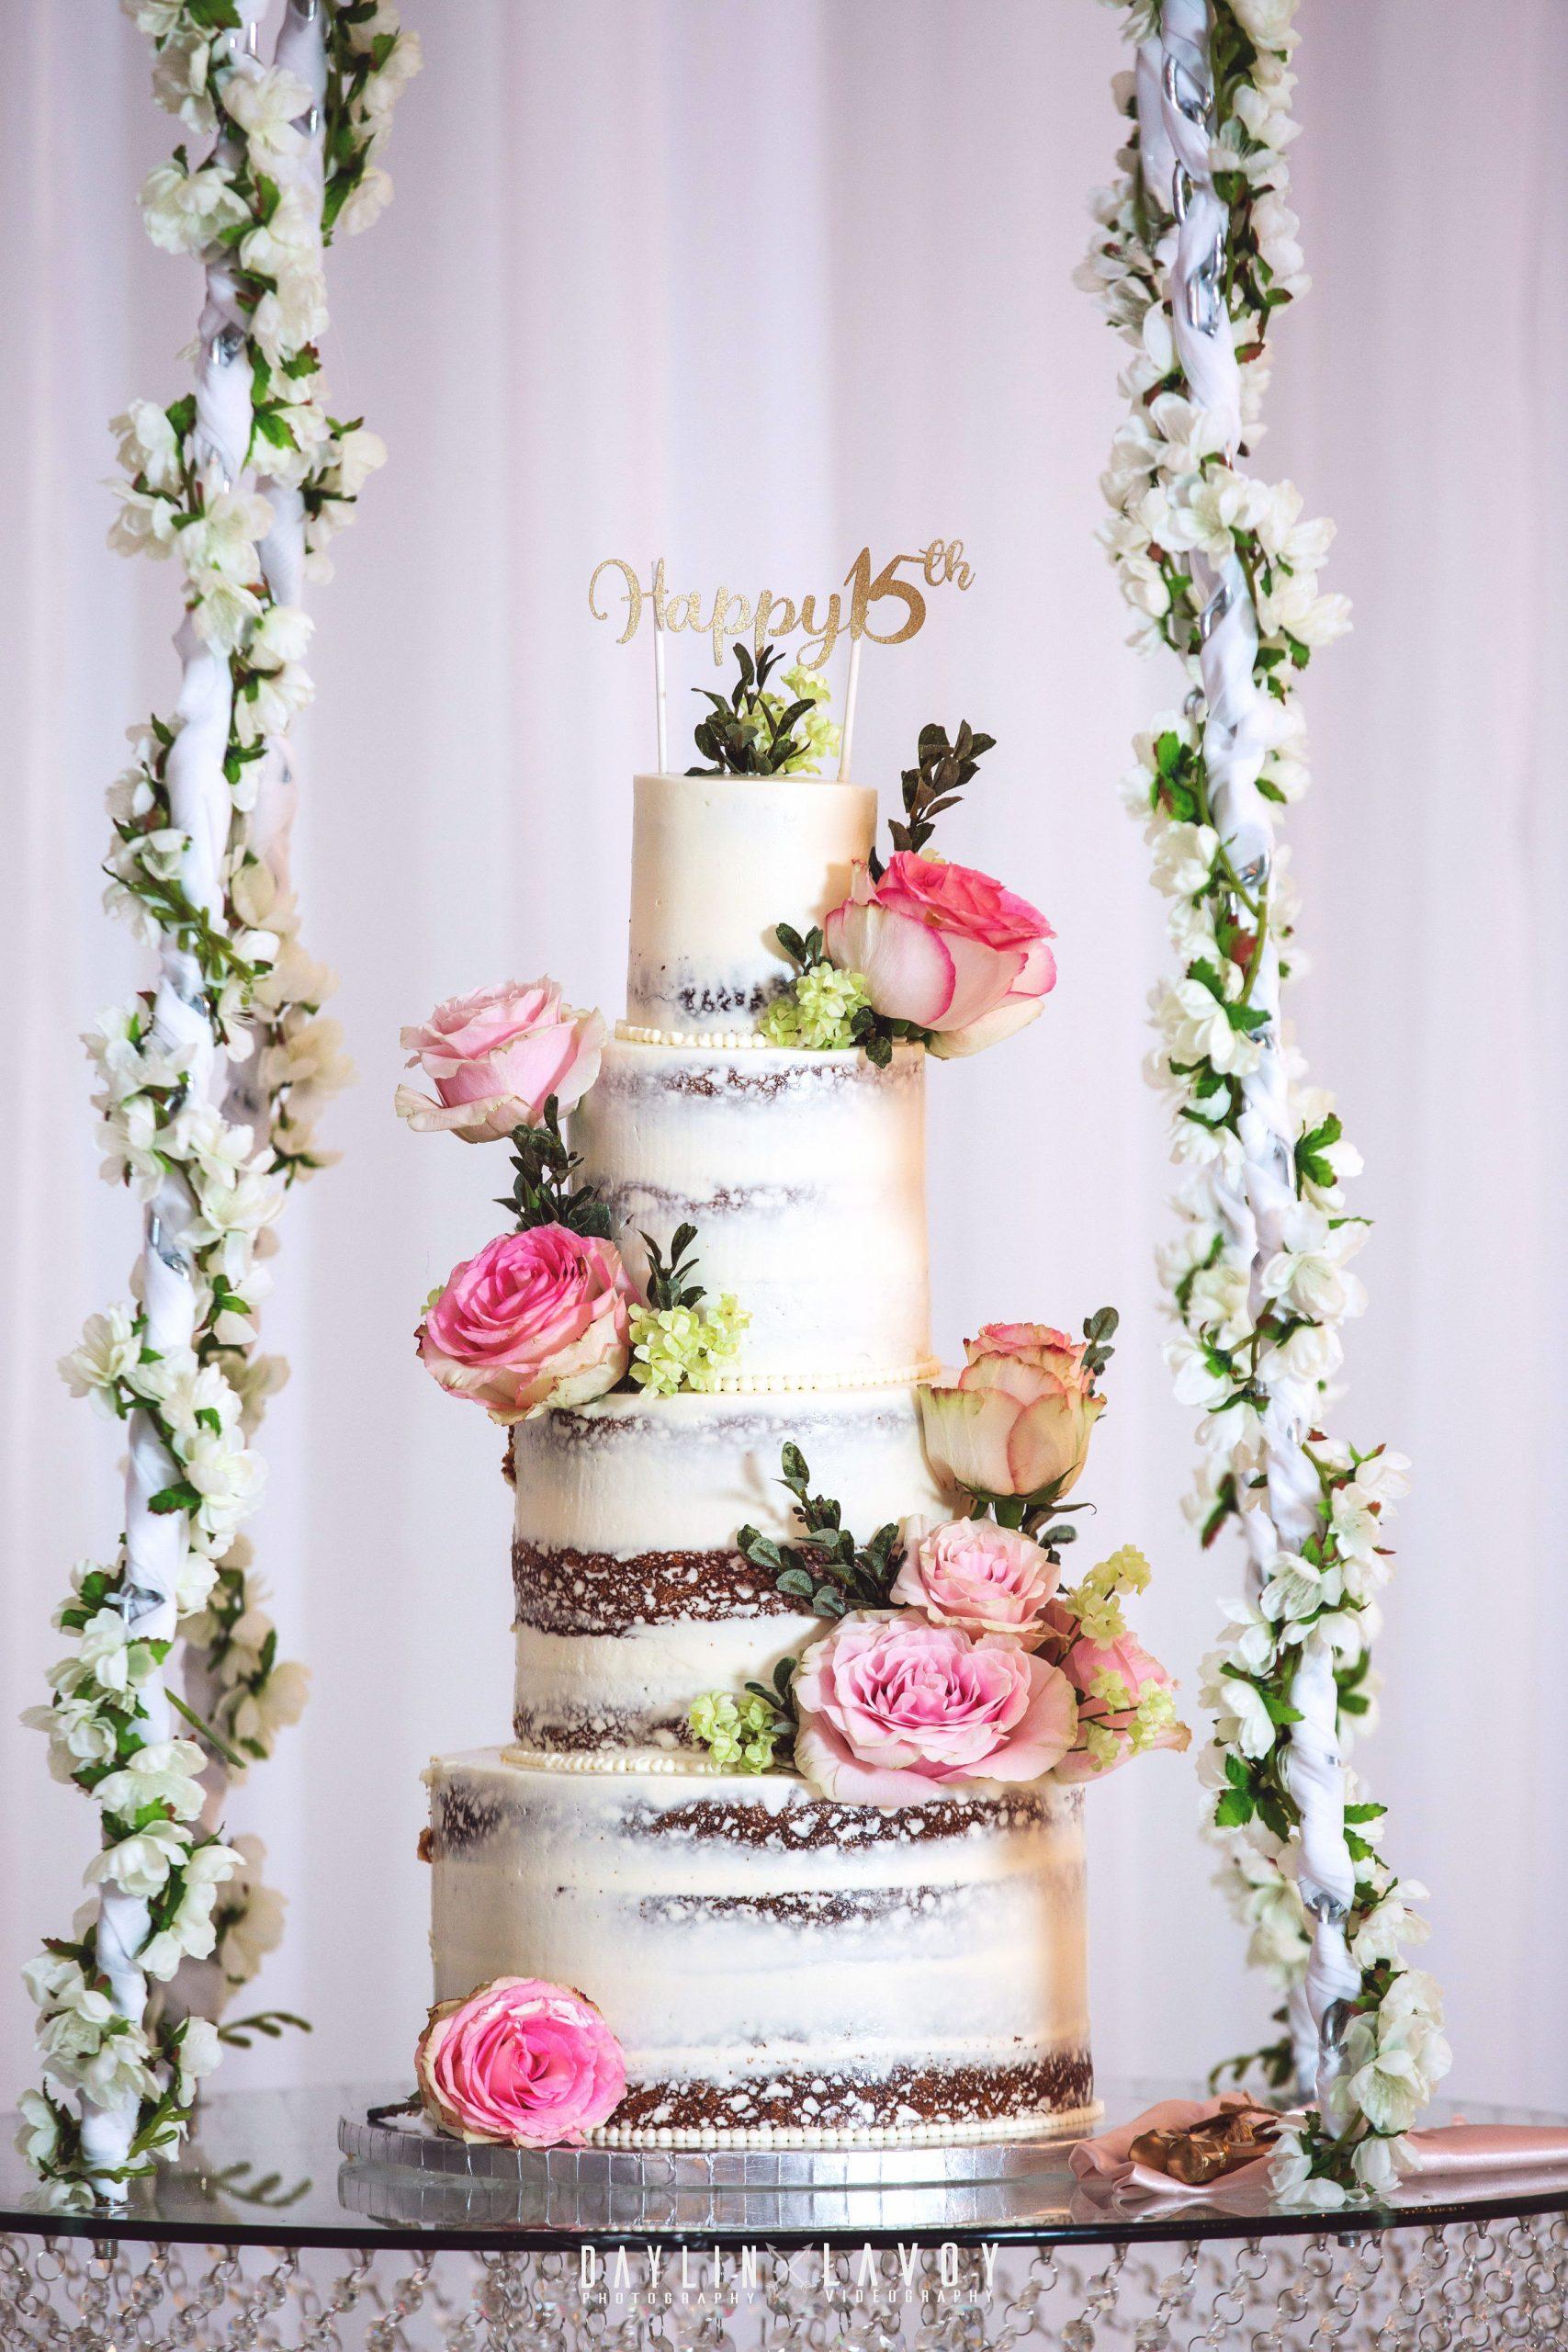 LeVenue Quinceañera full cake decor